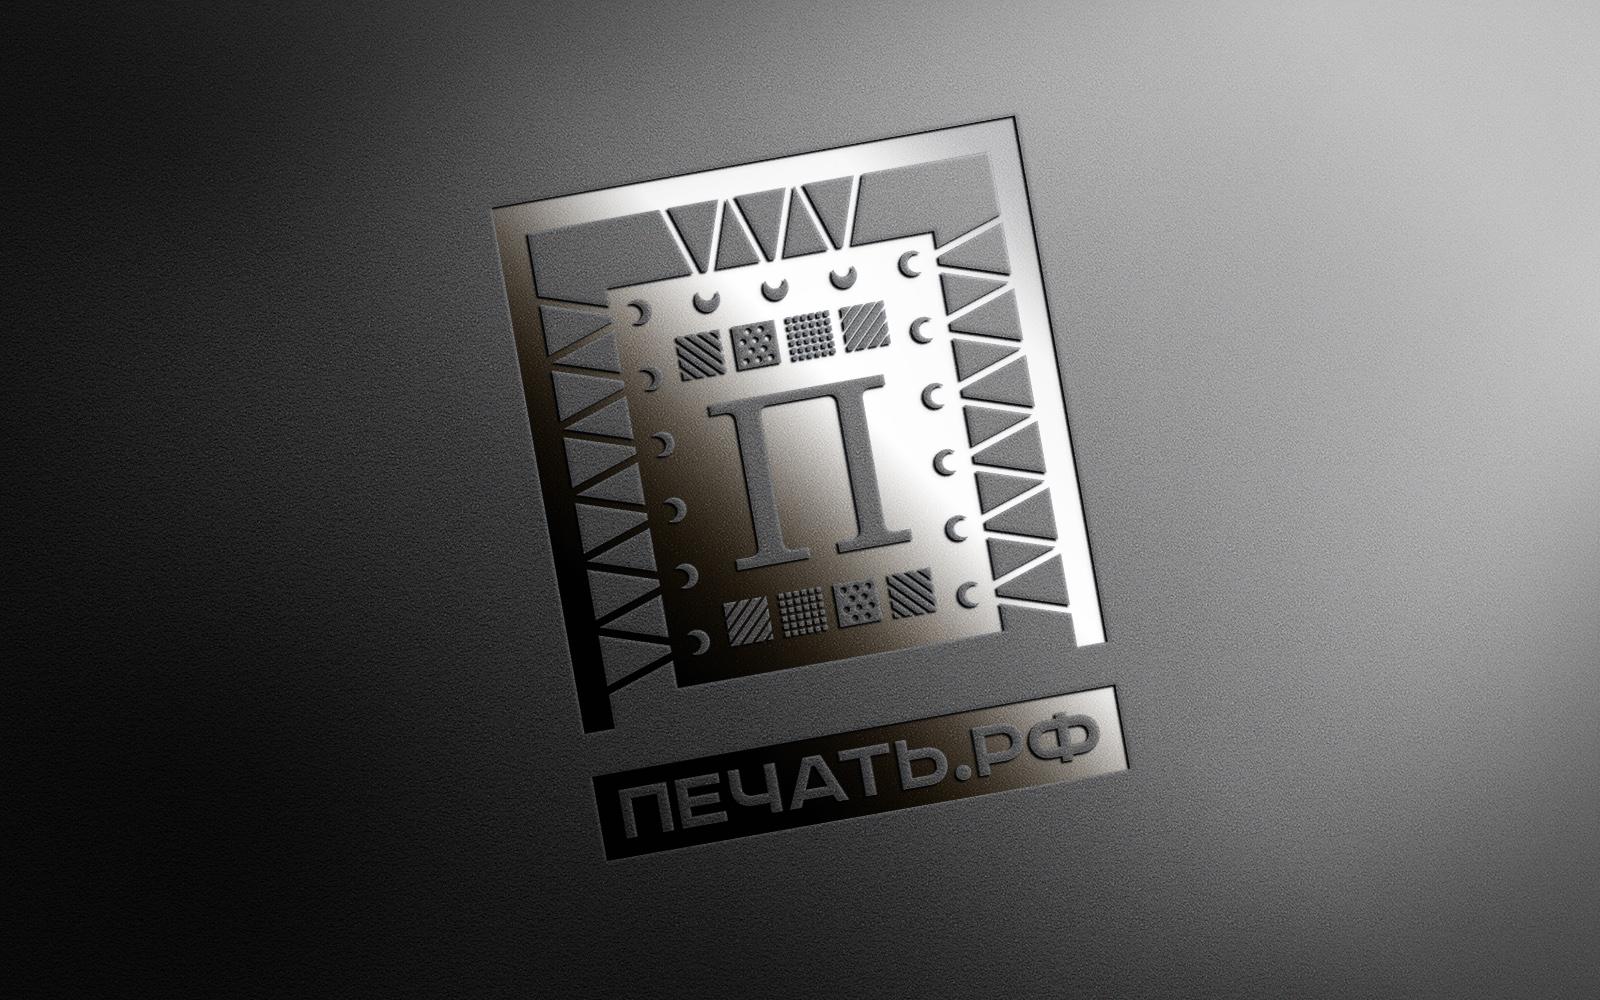 Логотип для веб-сервиса интерьерной печати и оперативной пол фото f_2775d29092b074c8.jpg